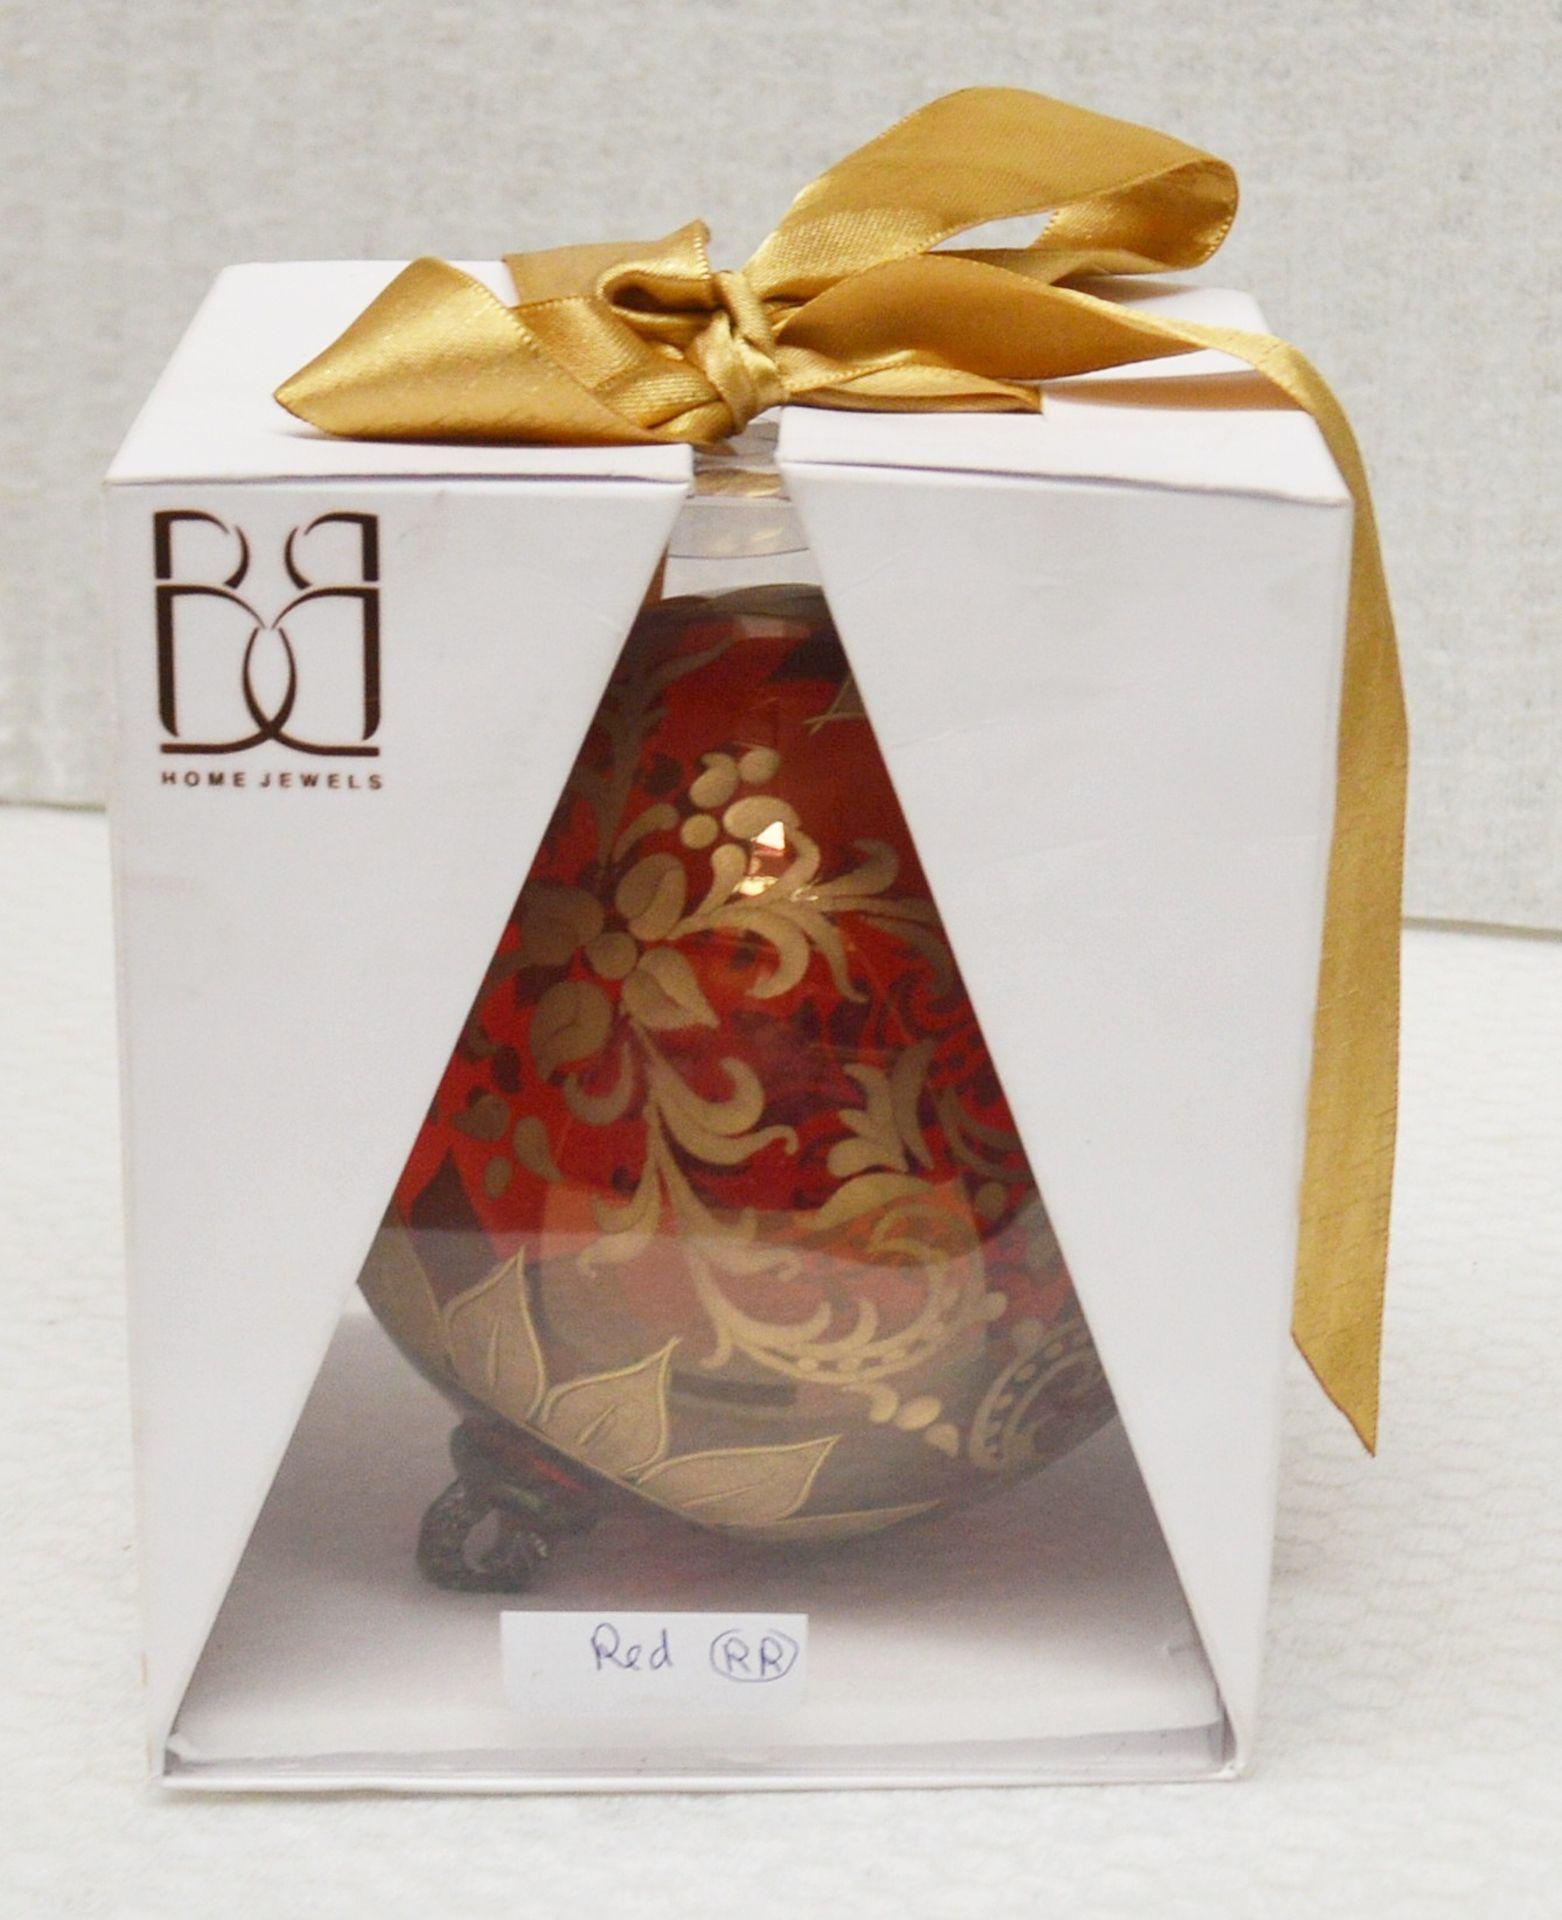 1 x BALDI 'Home Jewels' Italian Hand-crafted Artisan Christmas Tree Decoration - RRP £124.00